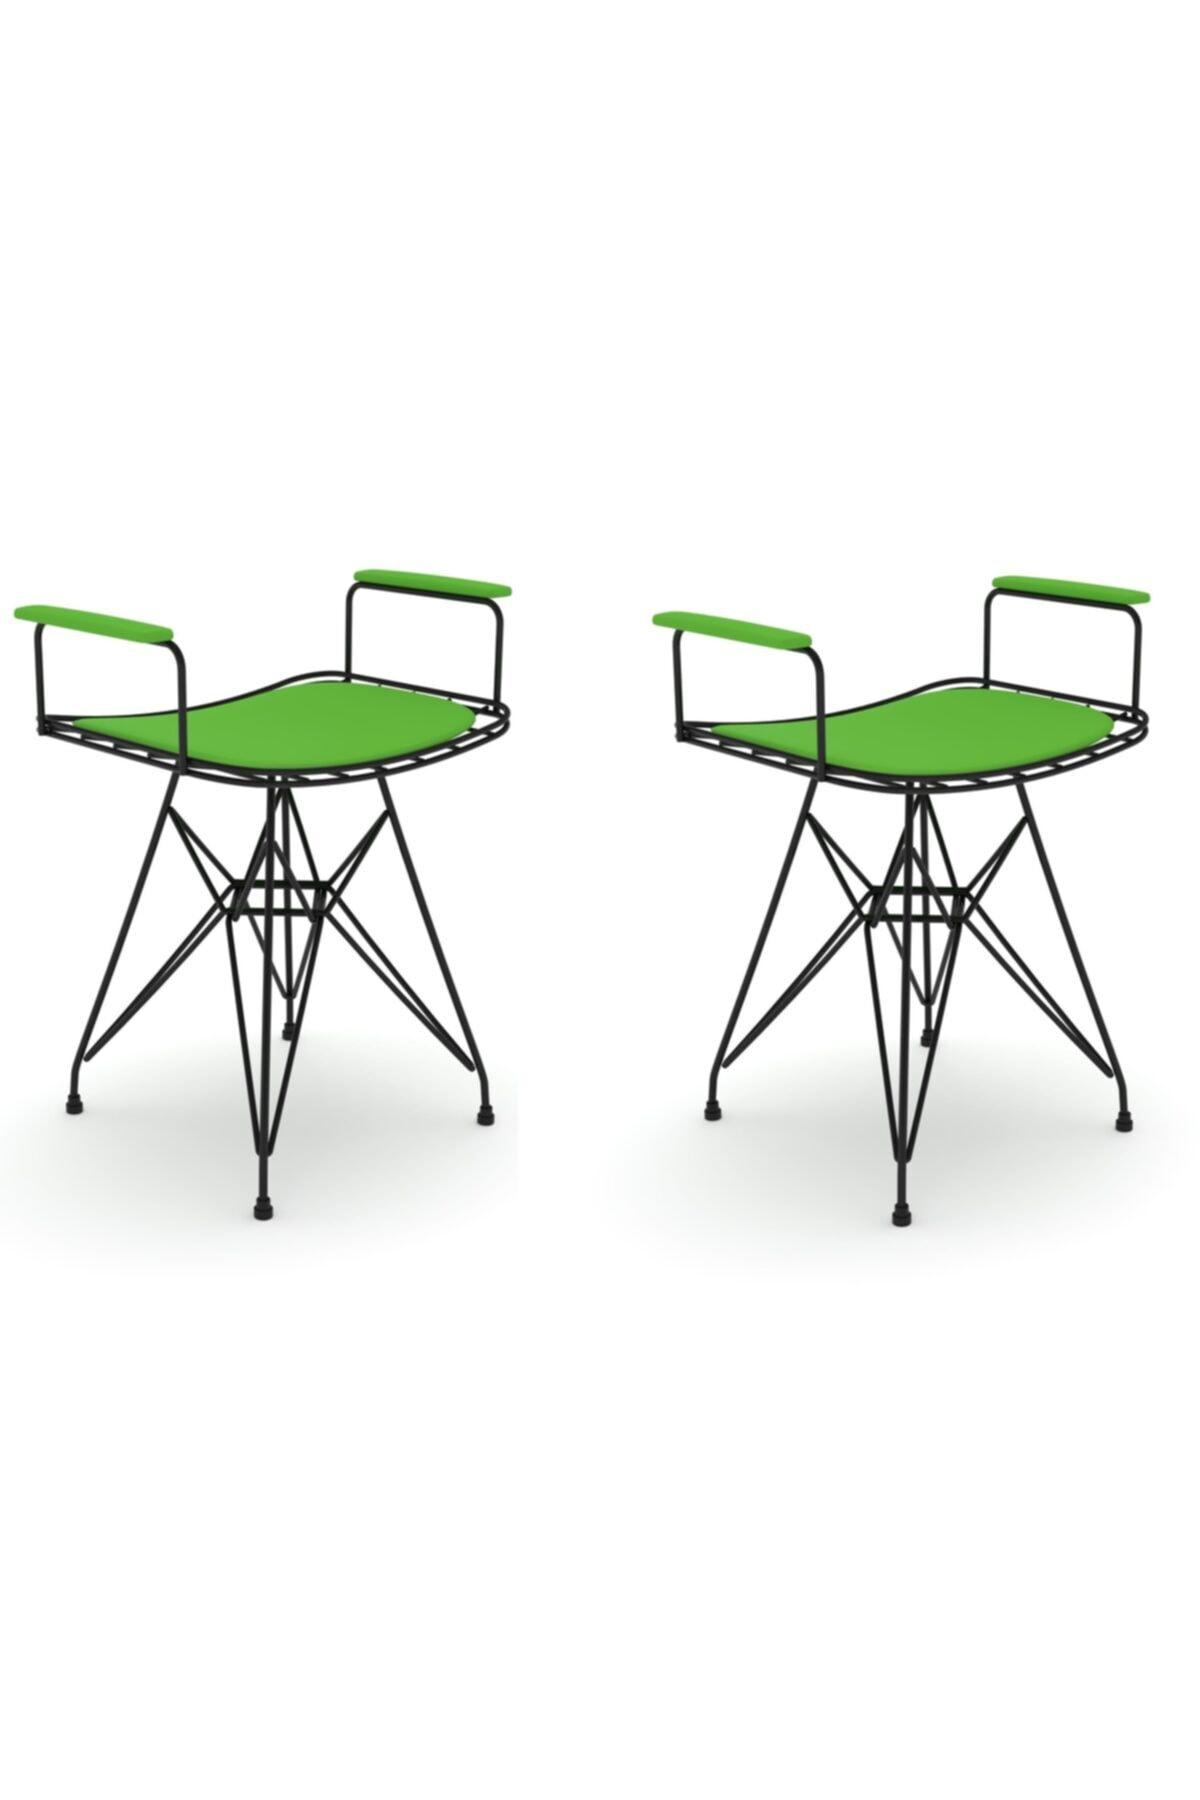 Knsz Kafes Tel Sandalyesi Tabure 2 Li Mutlu Syhyşl Kolçaklı Ofis Cafe Bahçe Mutfak